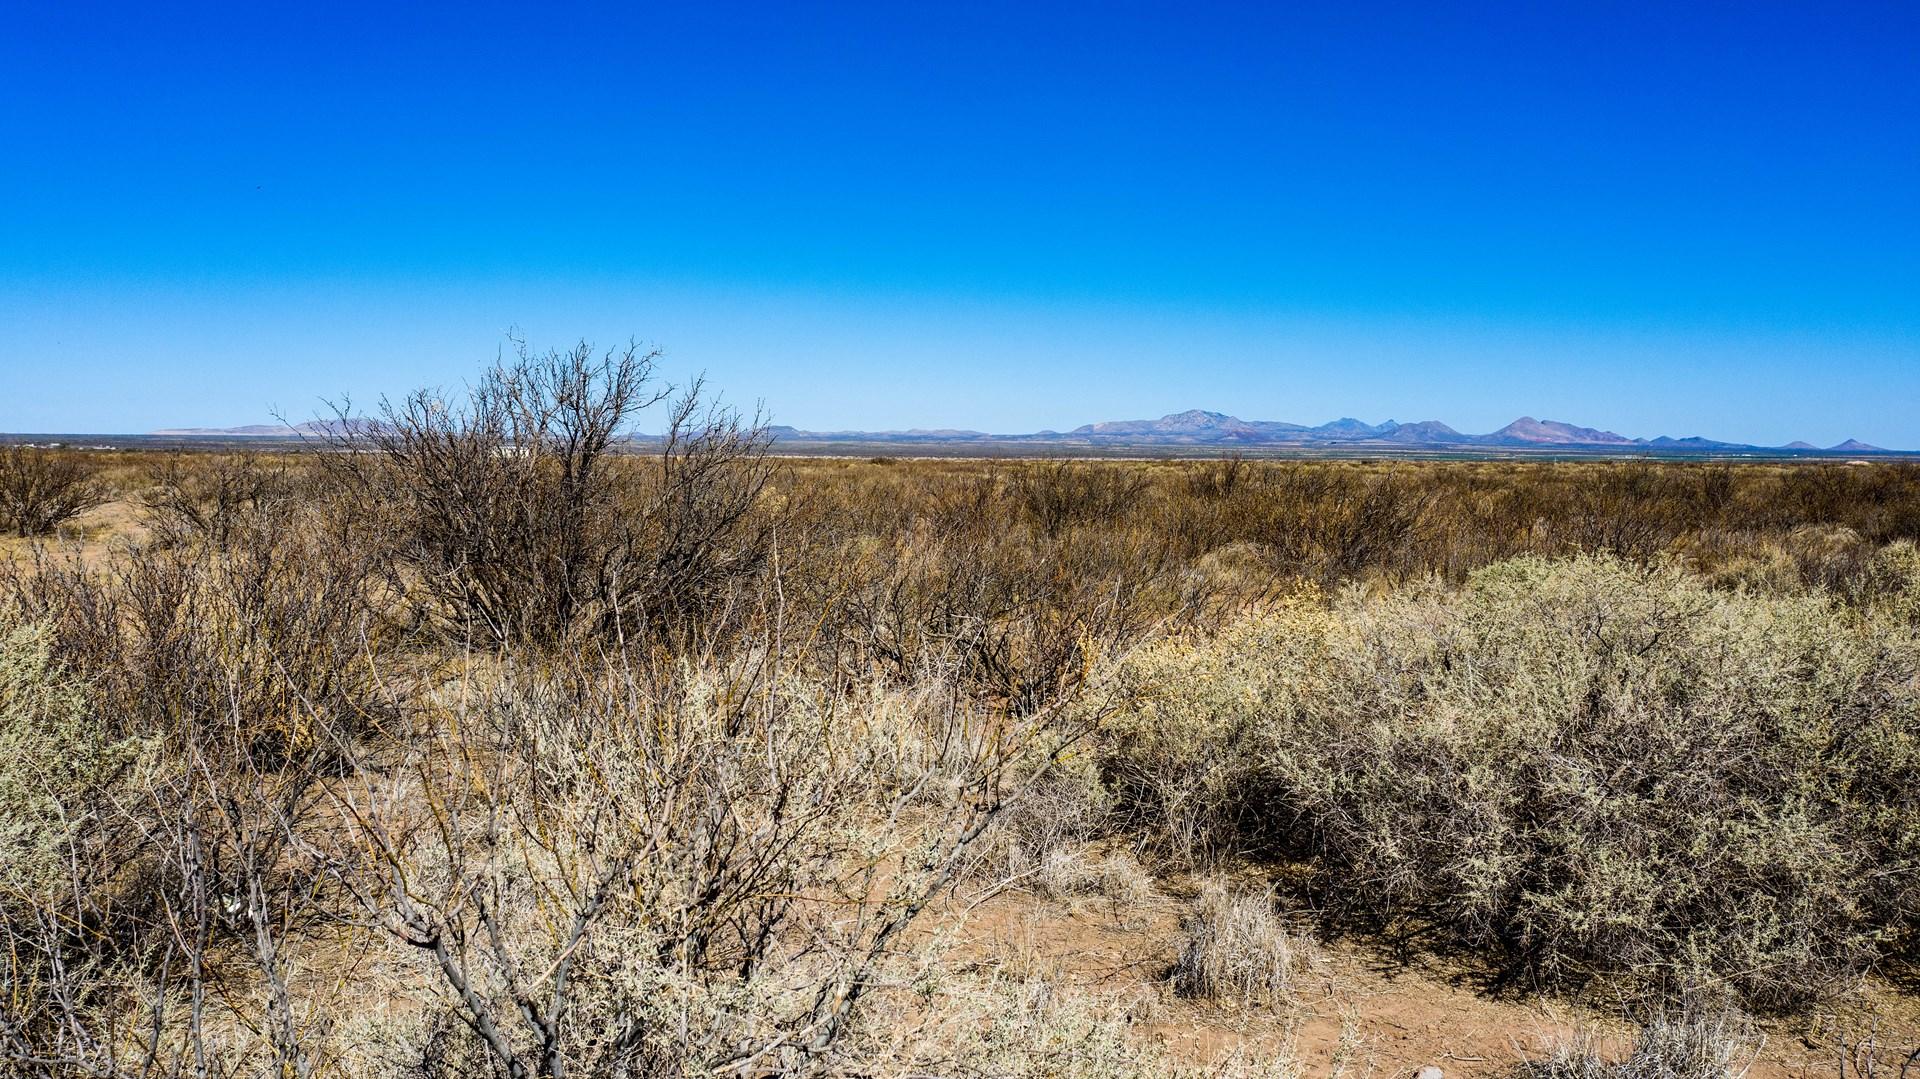 40 Acres in Pearce/Sunsites AZ